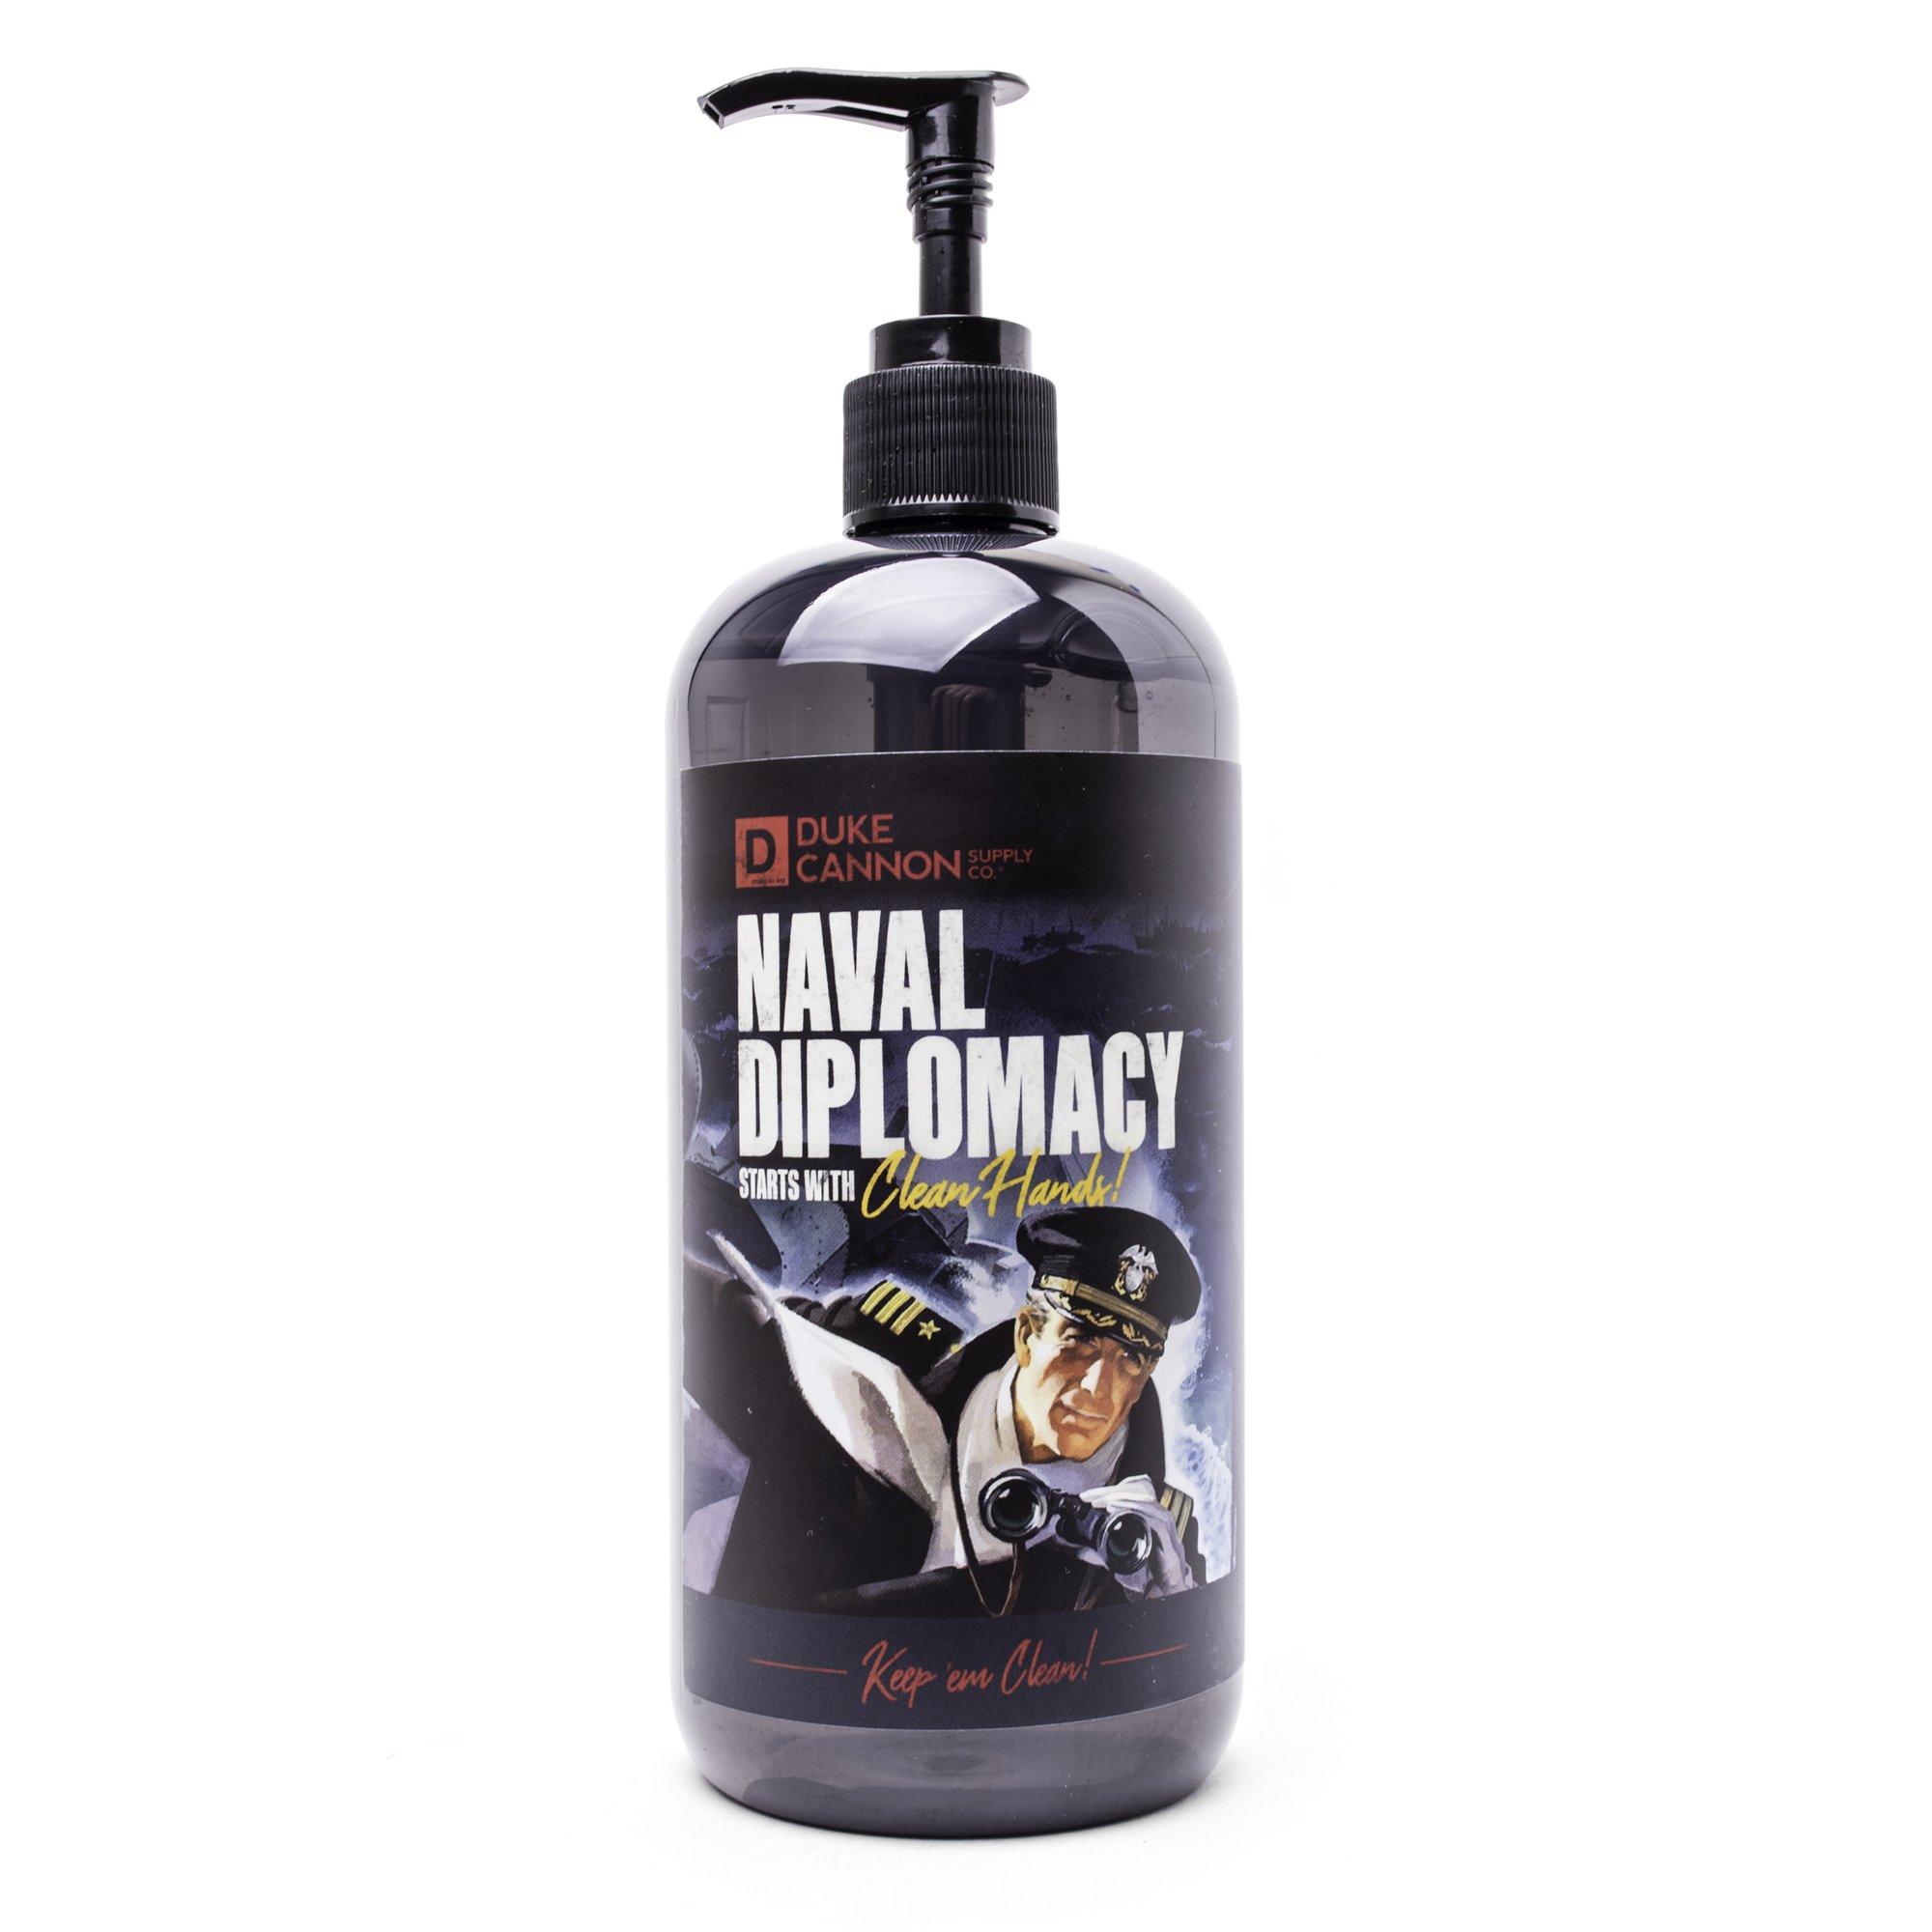 Liquid Hand Soap-Naval Diplomacy